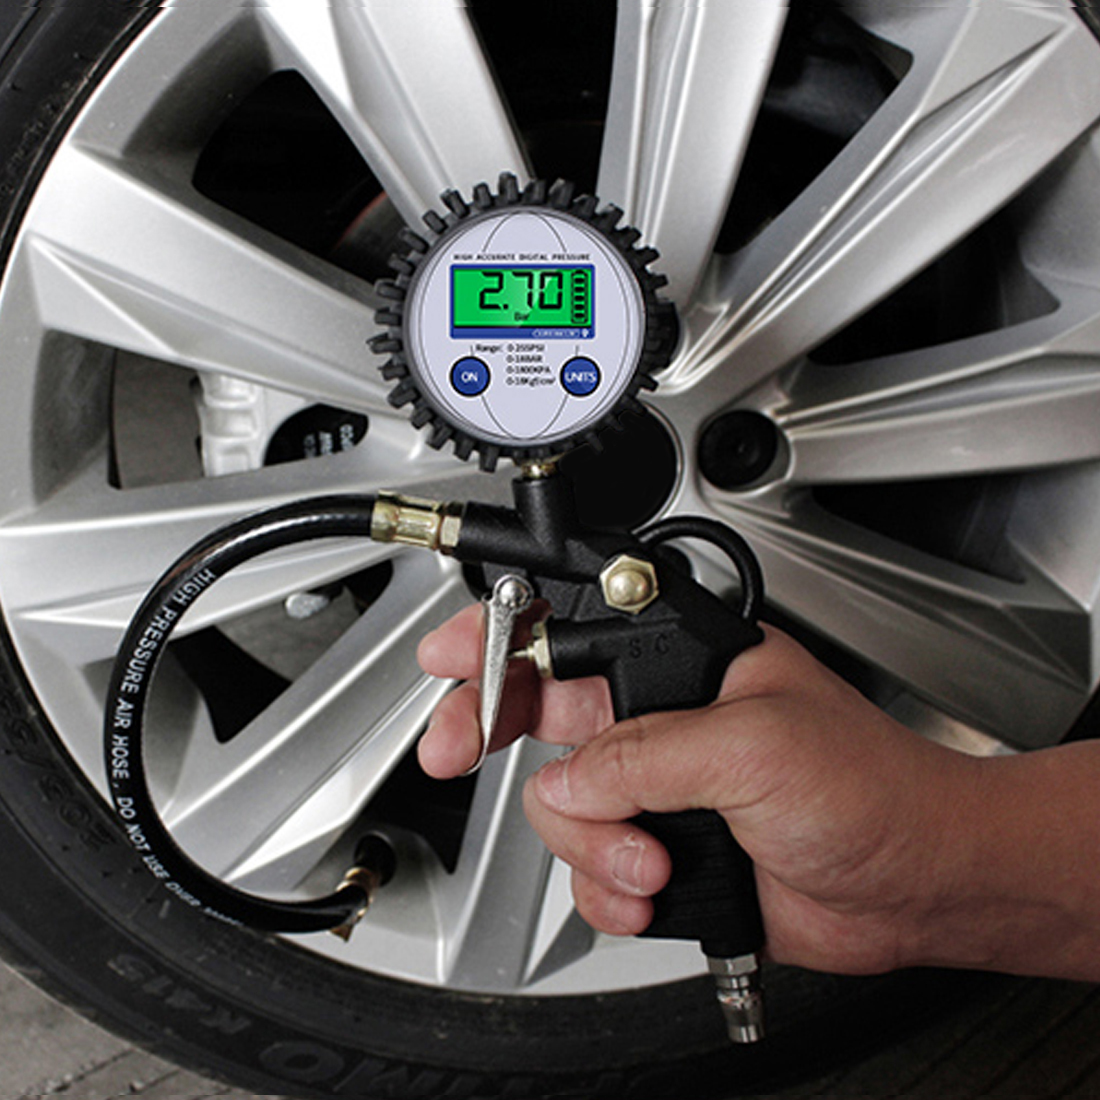 Hot  Air Pressure Inflator Gauge Meter Tester 0-220PSI 0-16bar Digital Tyre Pressure Gauge Tyre Tire Manometer